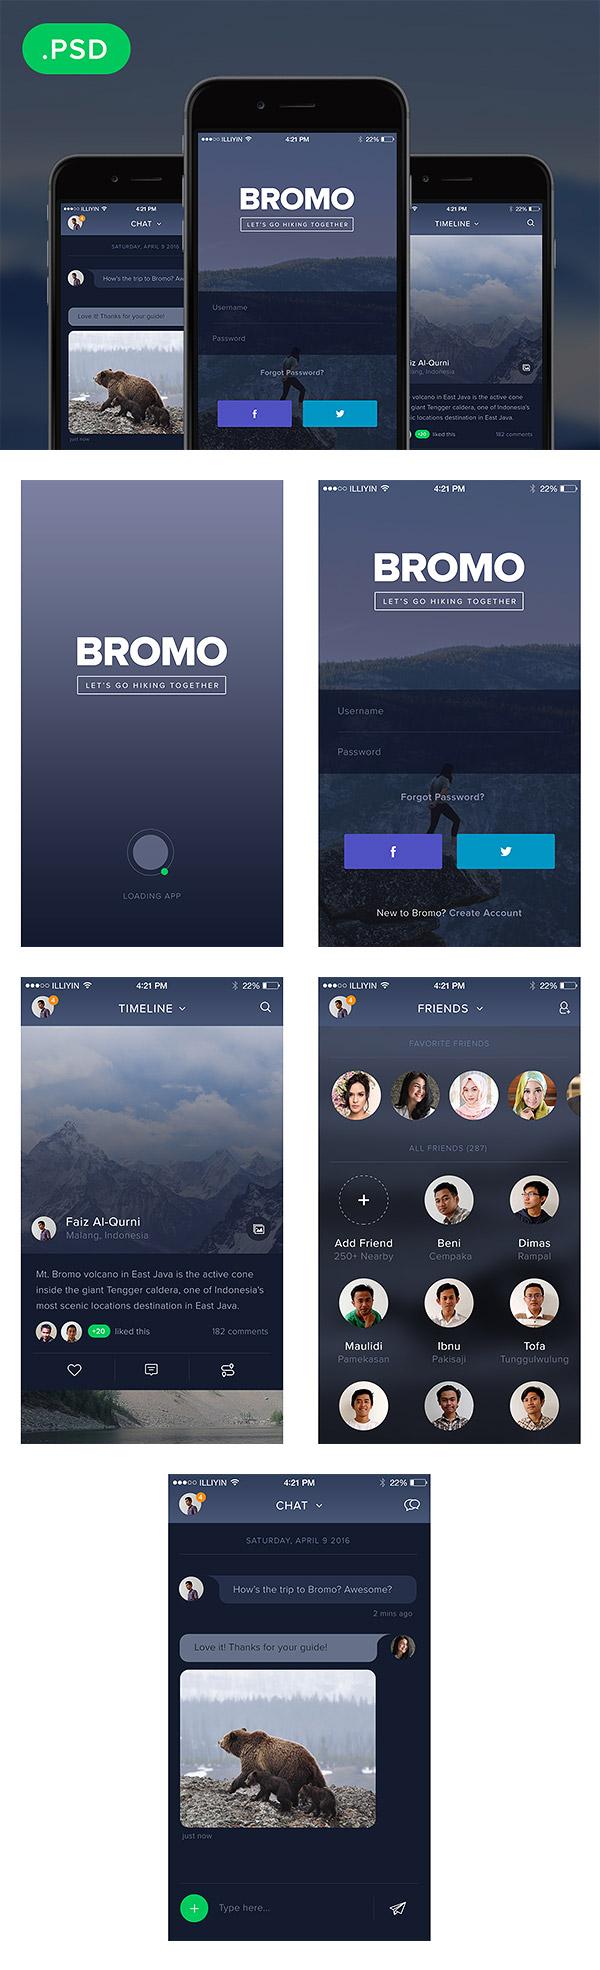 Bromo Social Mobile App UI Kit Free